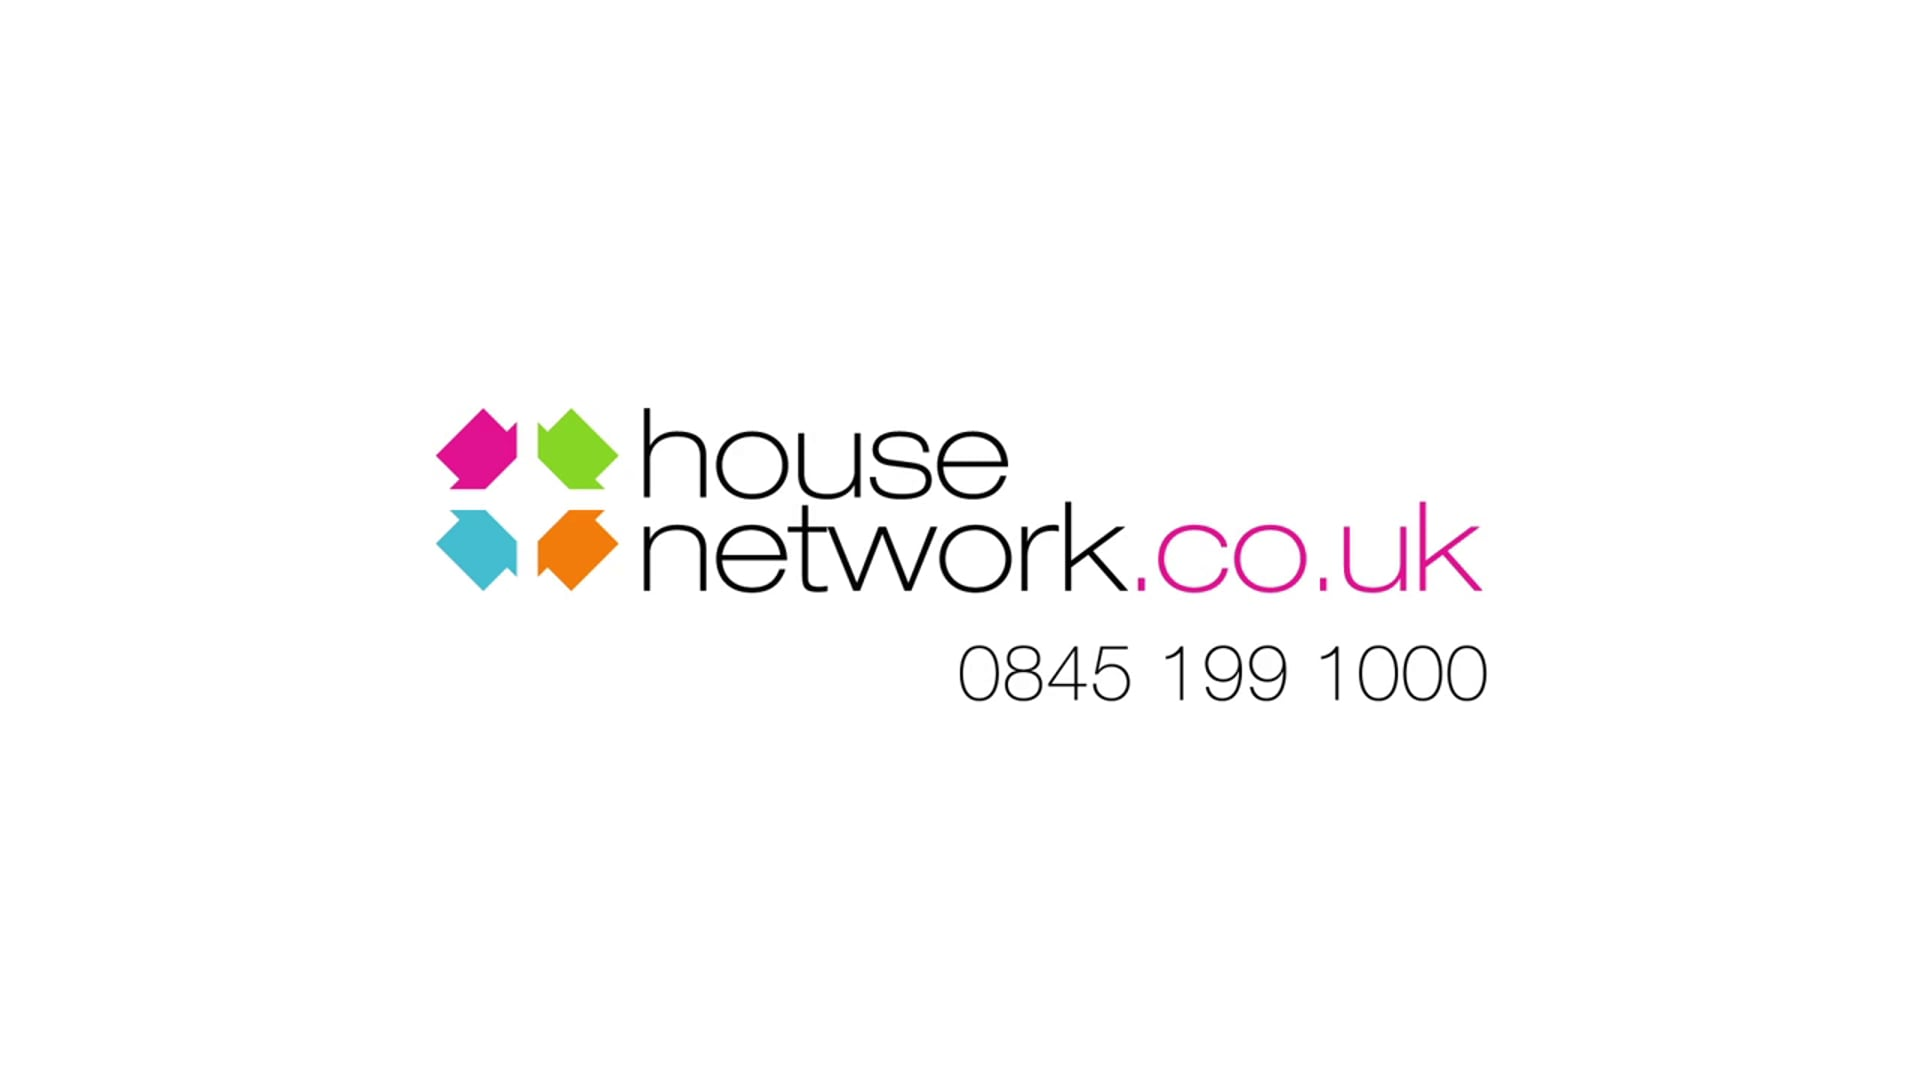 Jeff - House Network promo